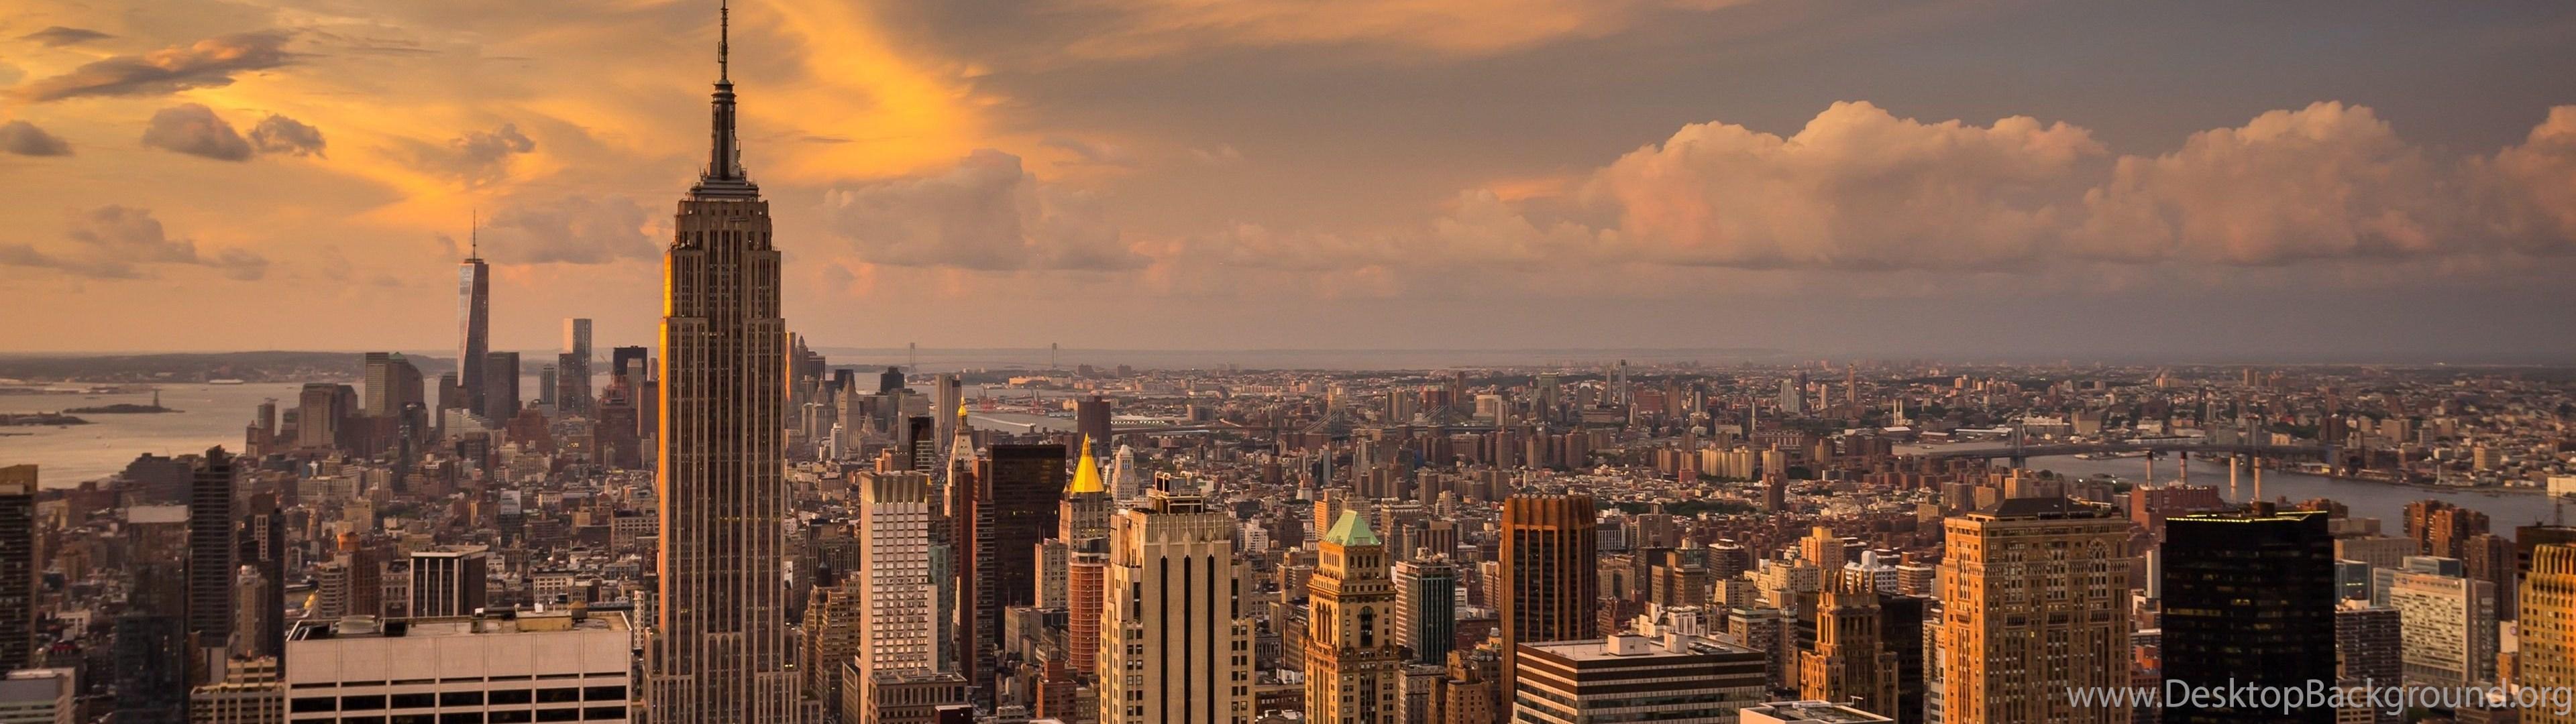 Landscape Clouds City Manhattan Sunset New York City Desktop Background